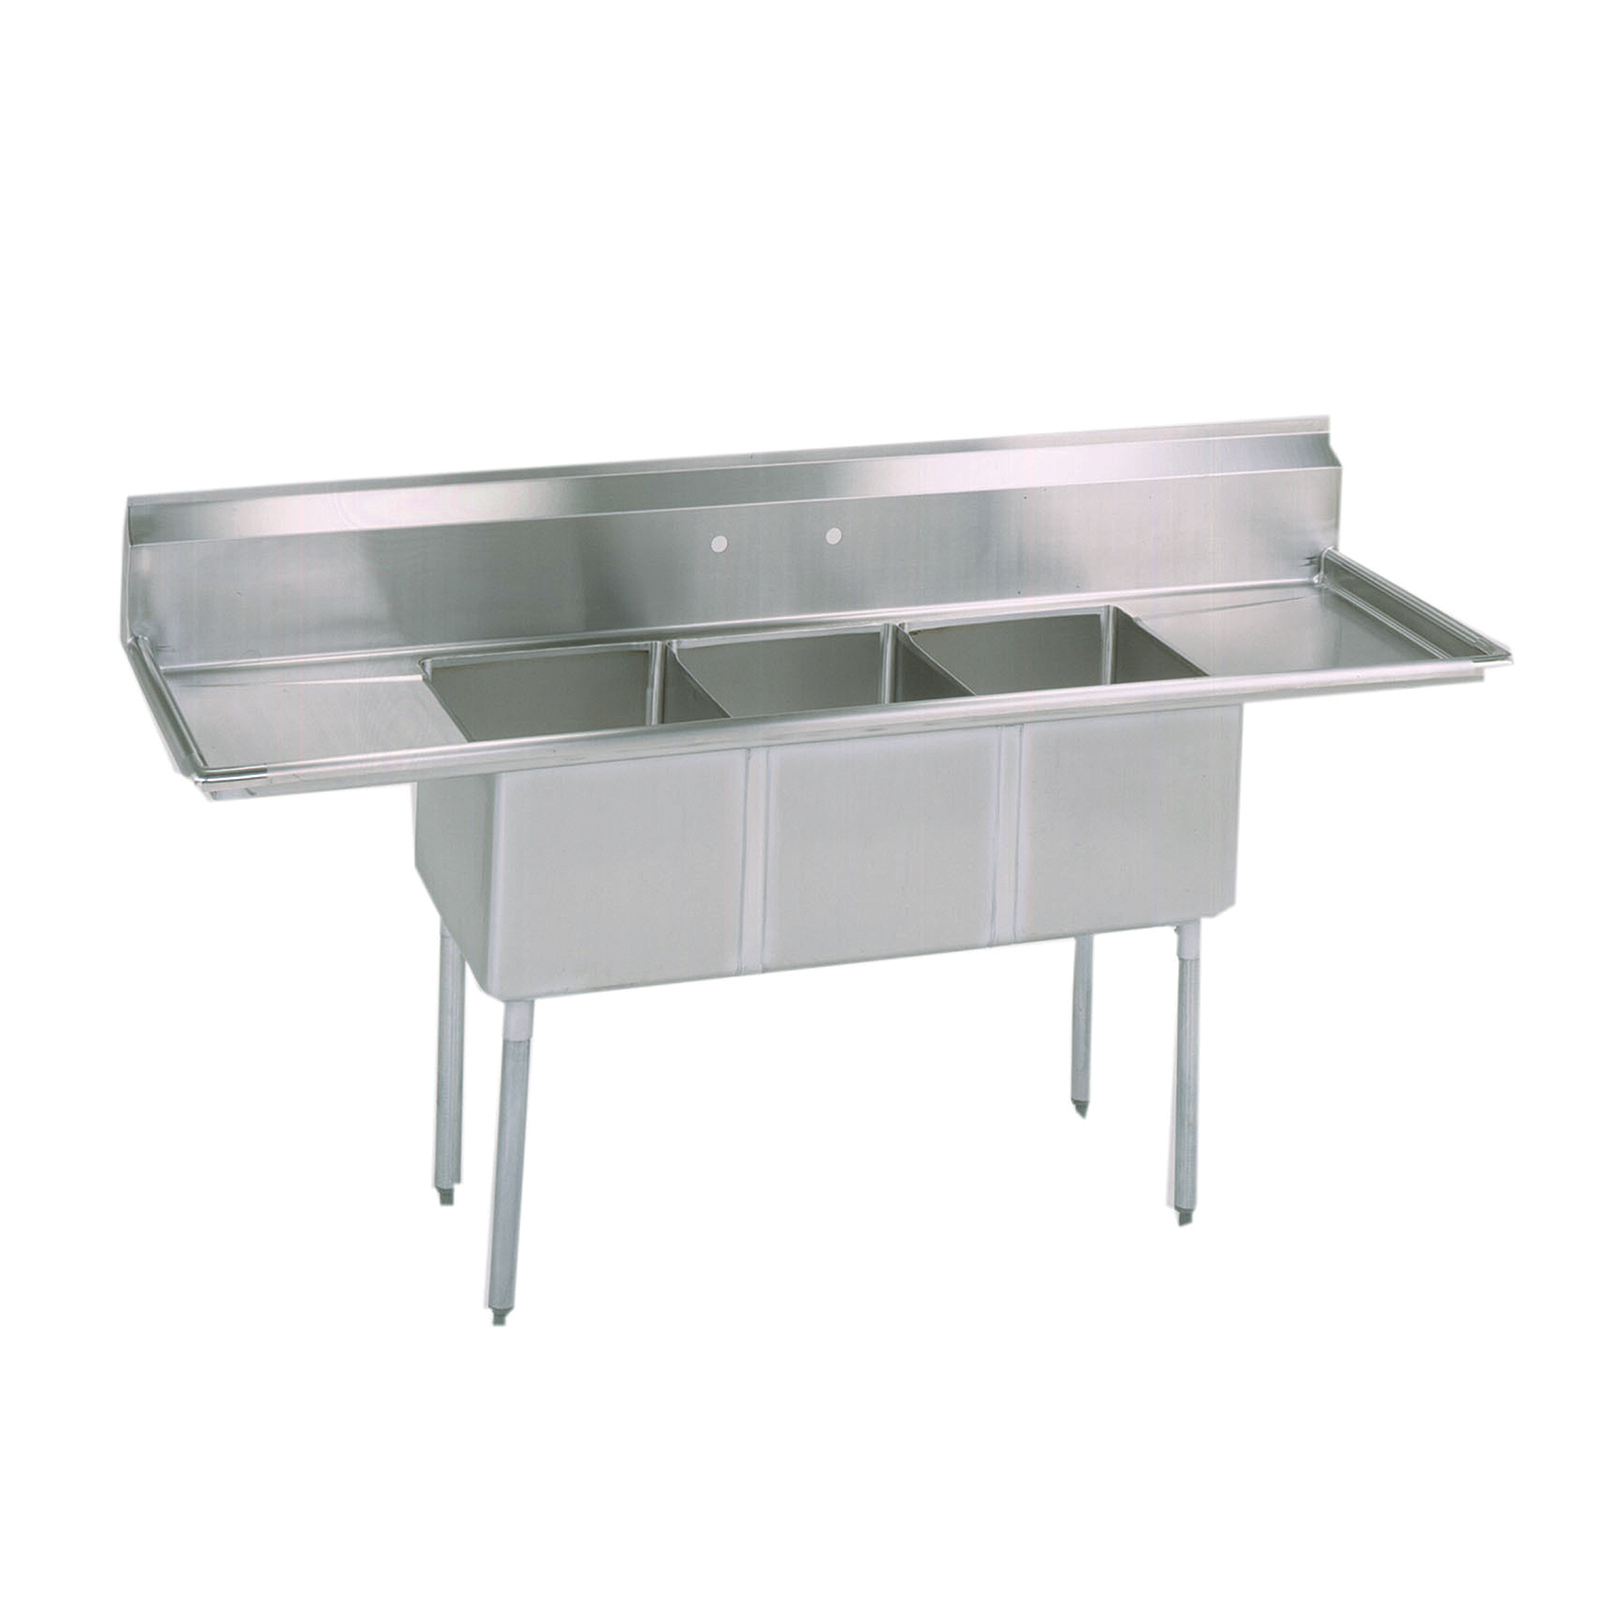 BK Resources BKS-3-1620-12-18T sink, (3) three compartment